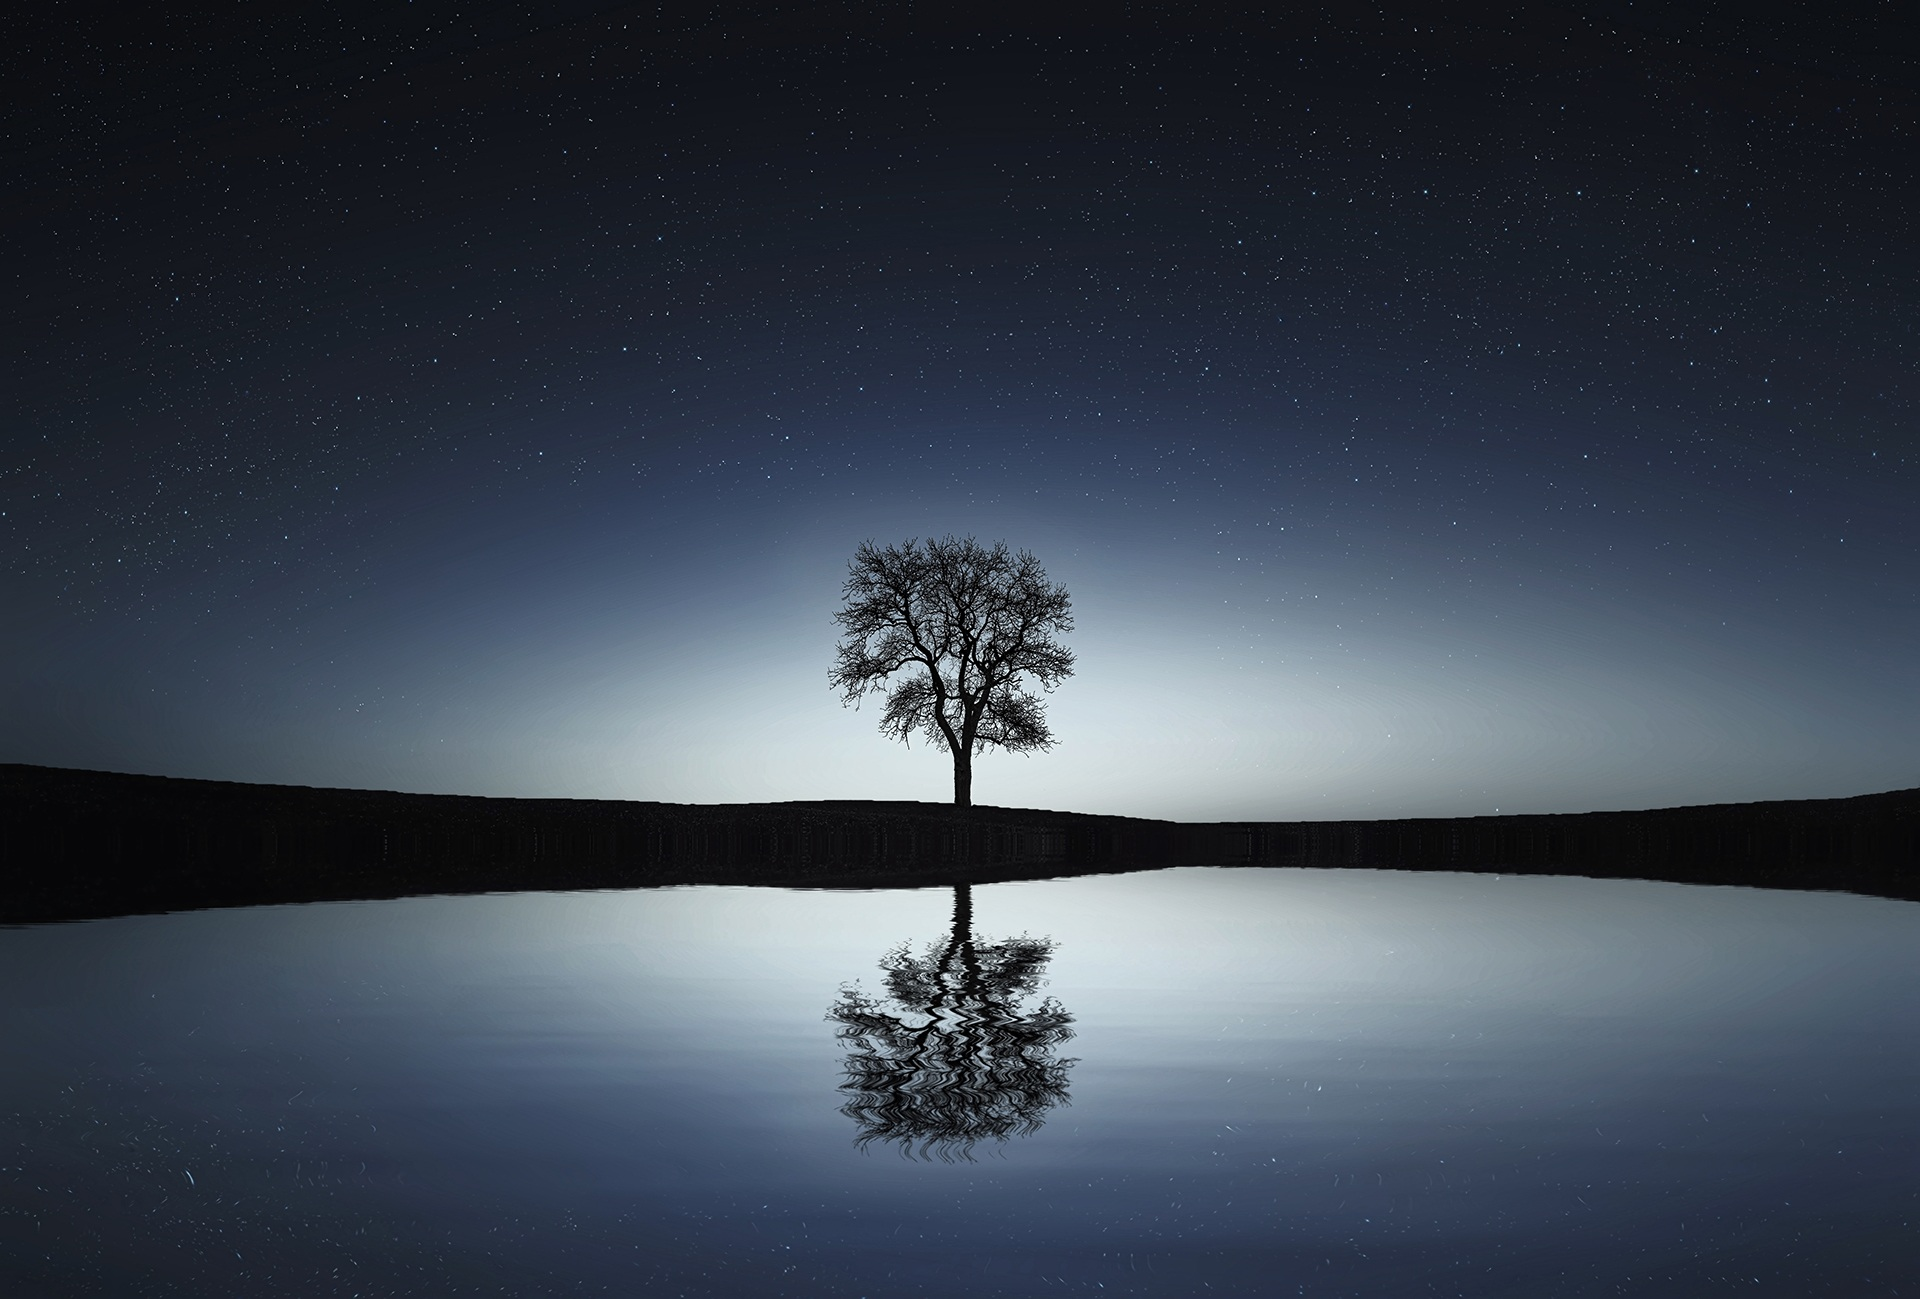 Lonely tree at night, lake, mirror, night, stars, reflection, sky, water, tree